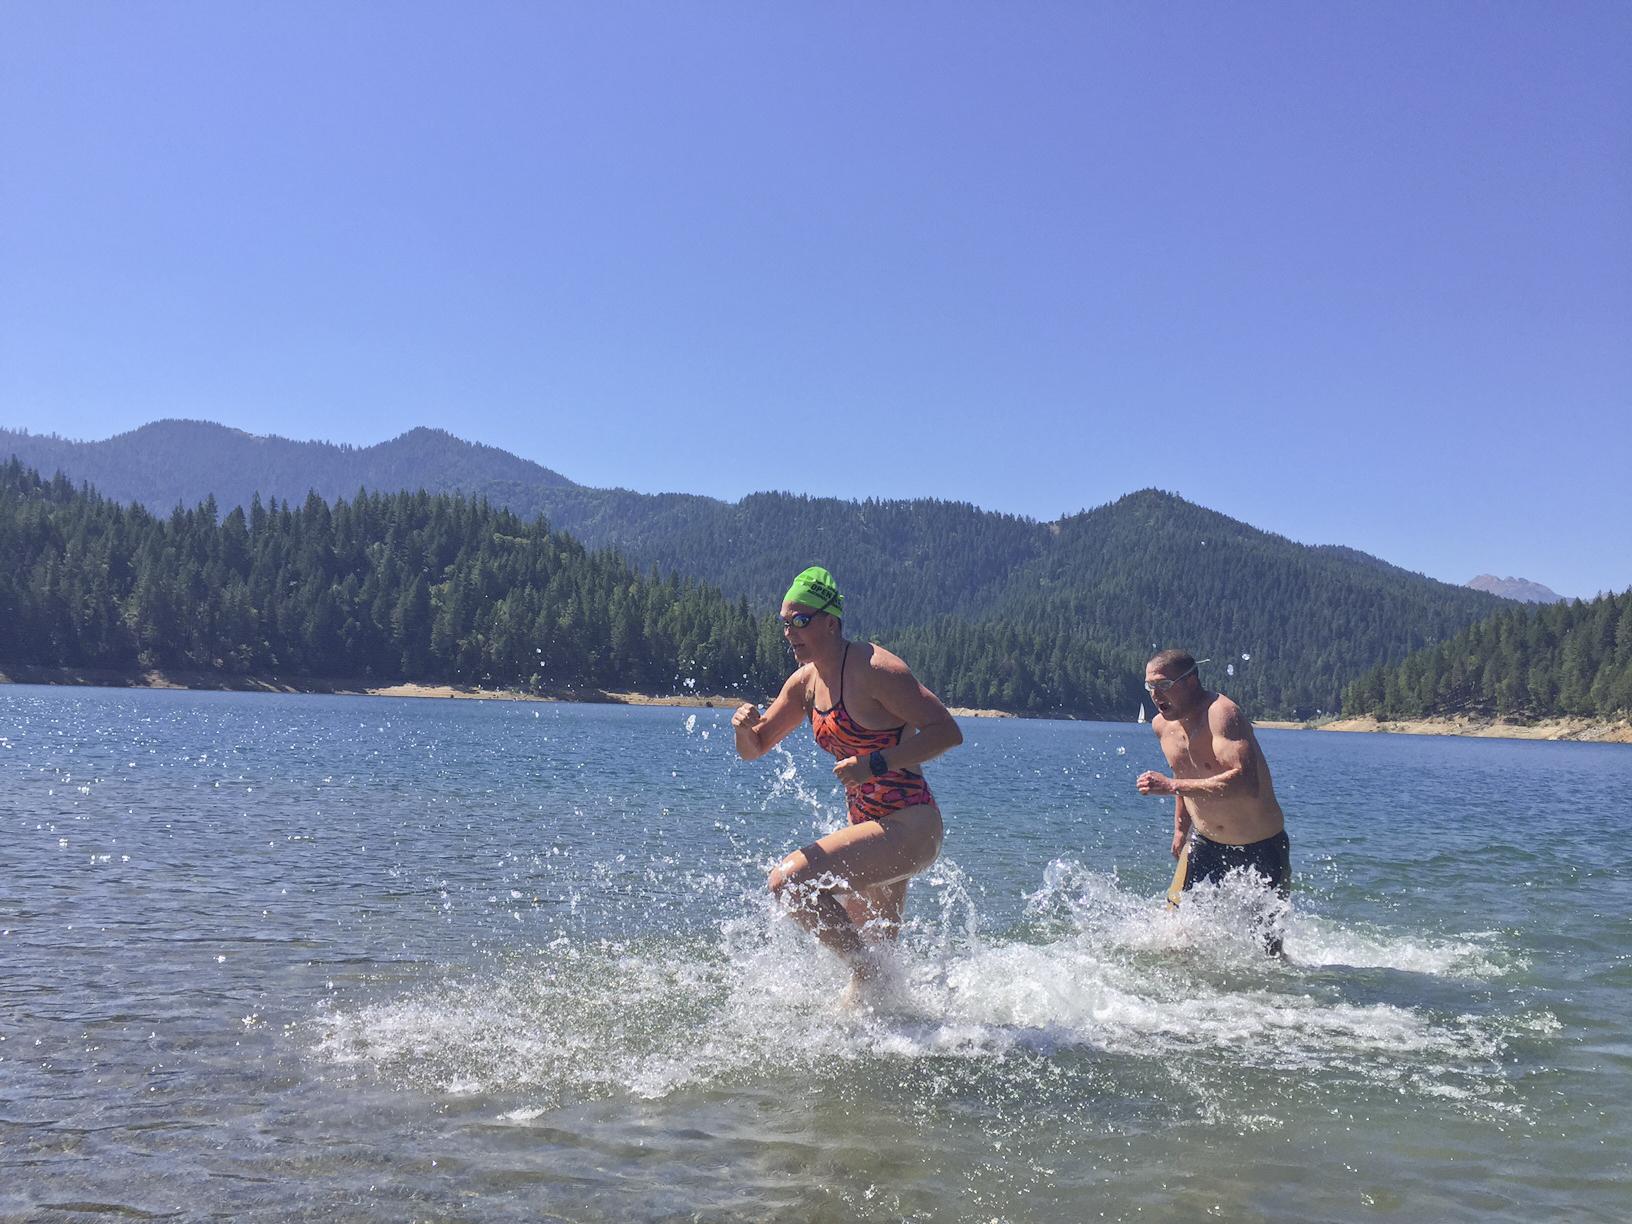 Matt Miller (RVM) is chasing Lisa Gibson (NIKE) in the 500m pursuit relay